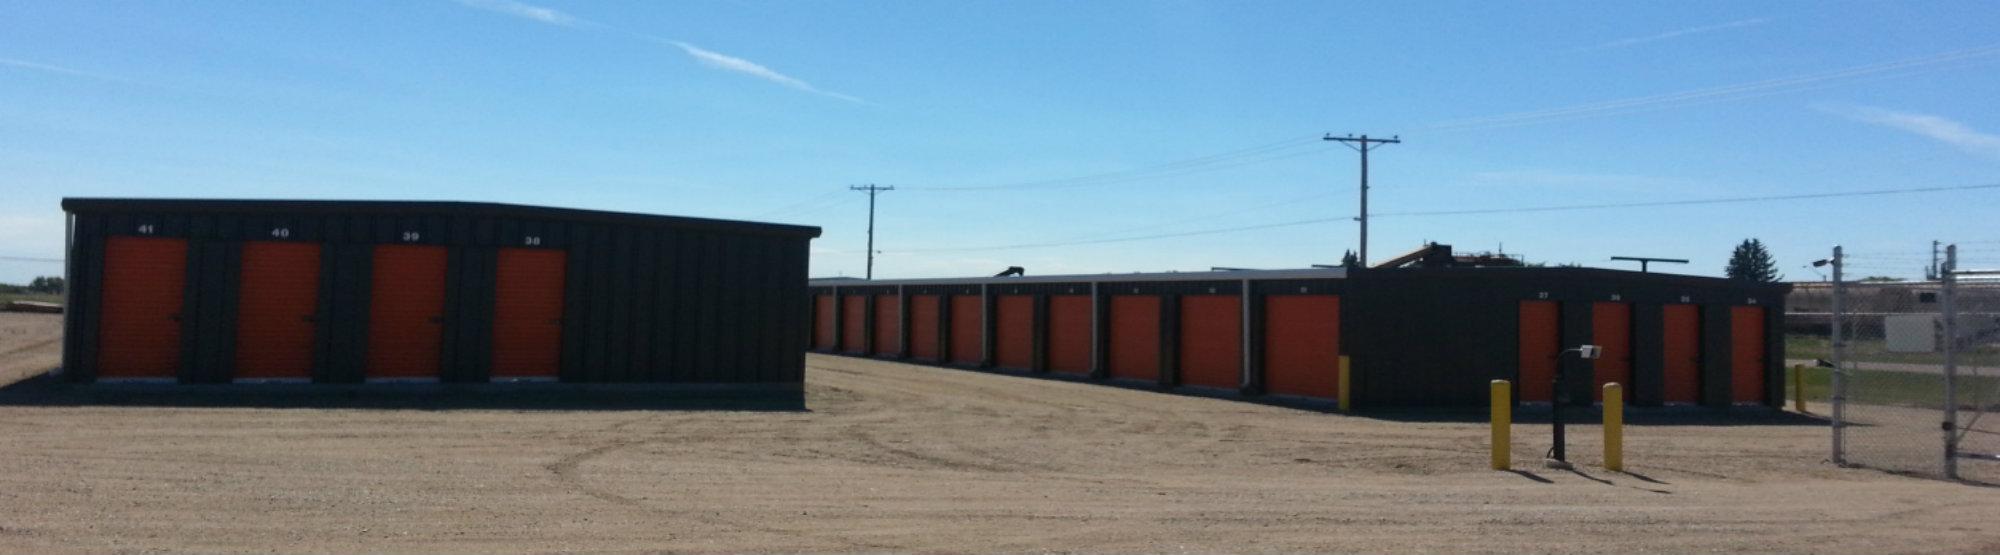 Great North Storage Company